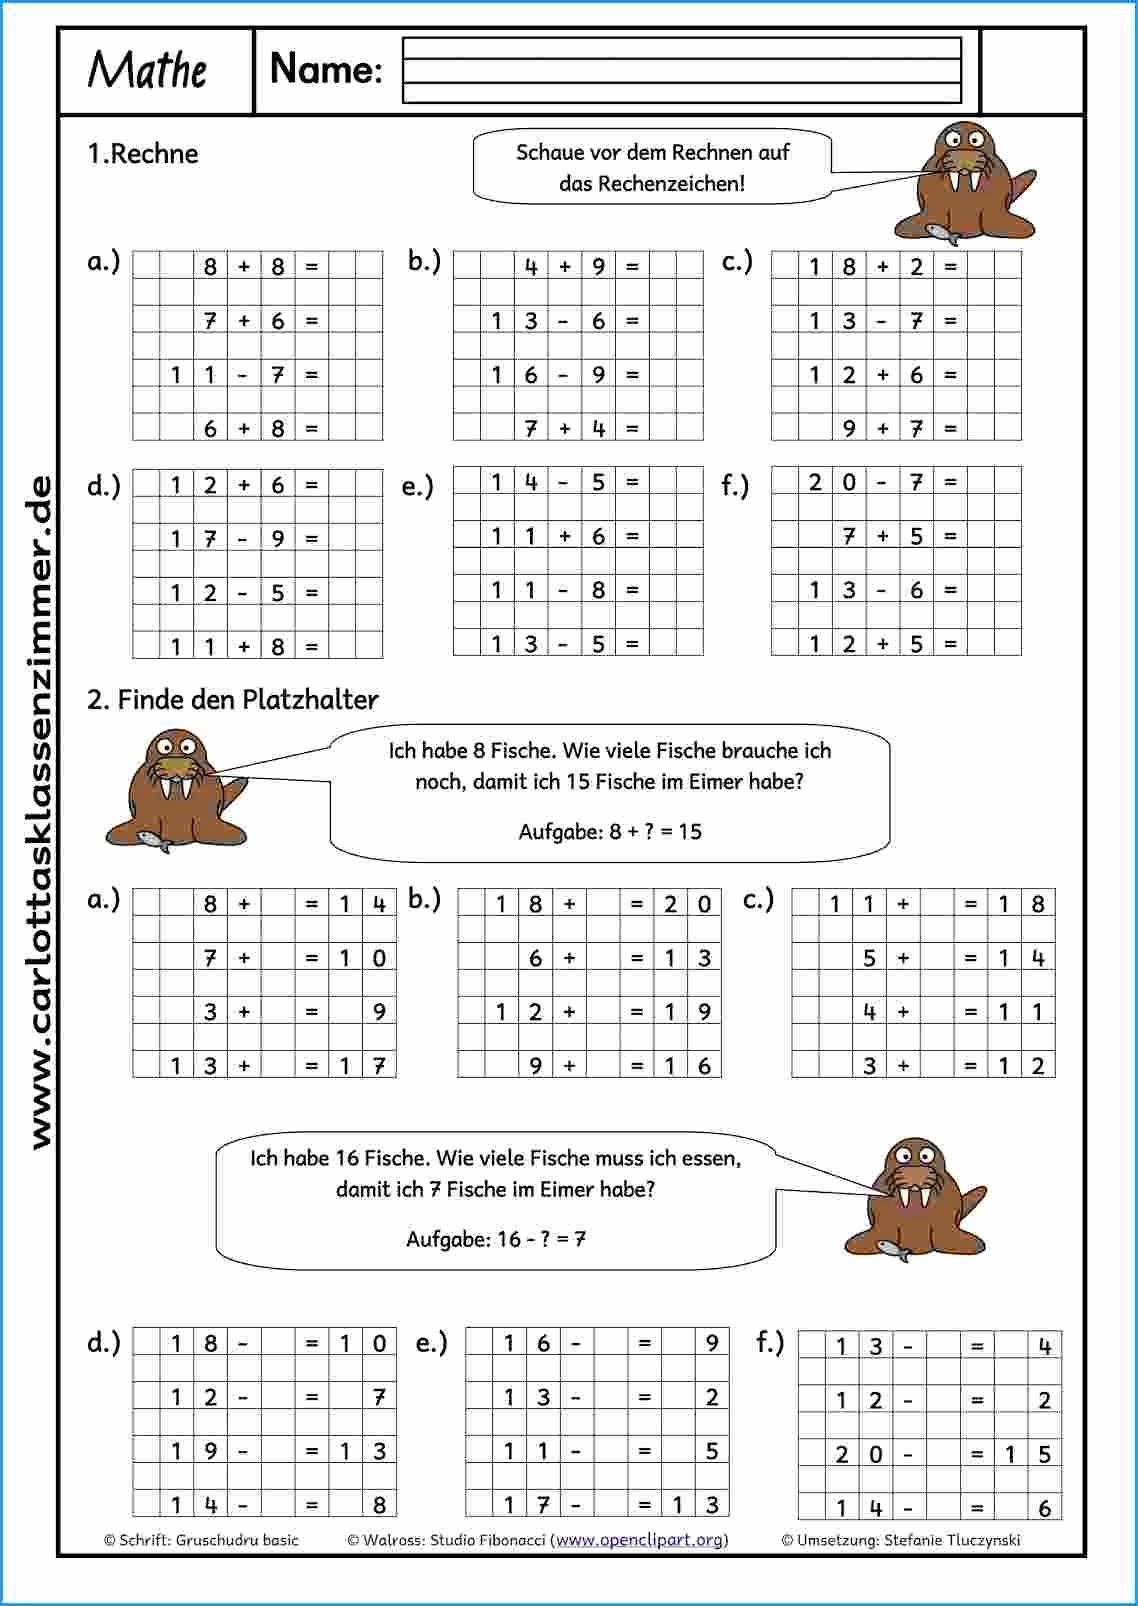 Arbeitsblatter Mathe 3 Klasse Kostenlos Best Kostenlose mit Kostenlose Arbeitsblätter Mathe